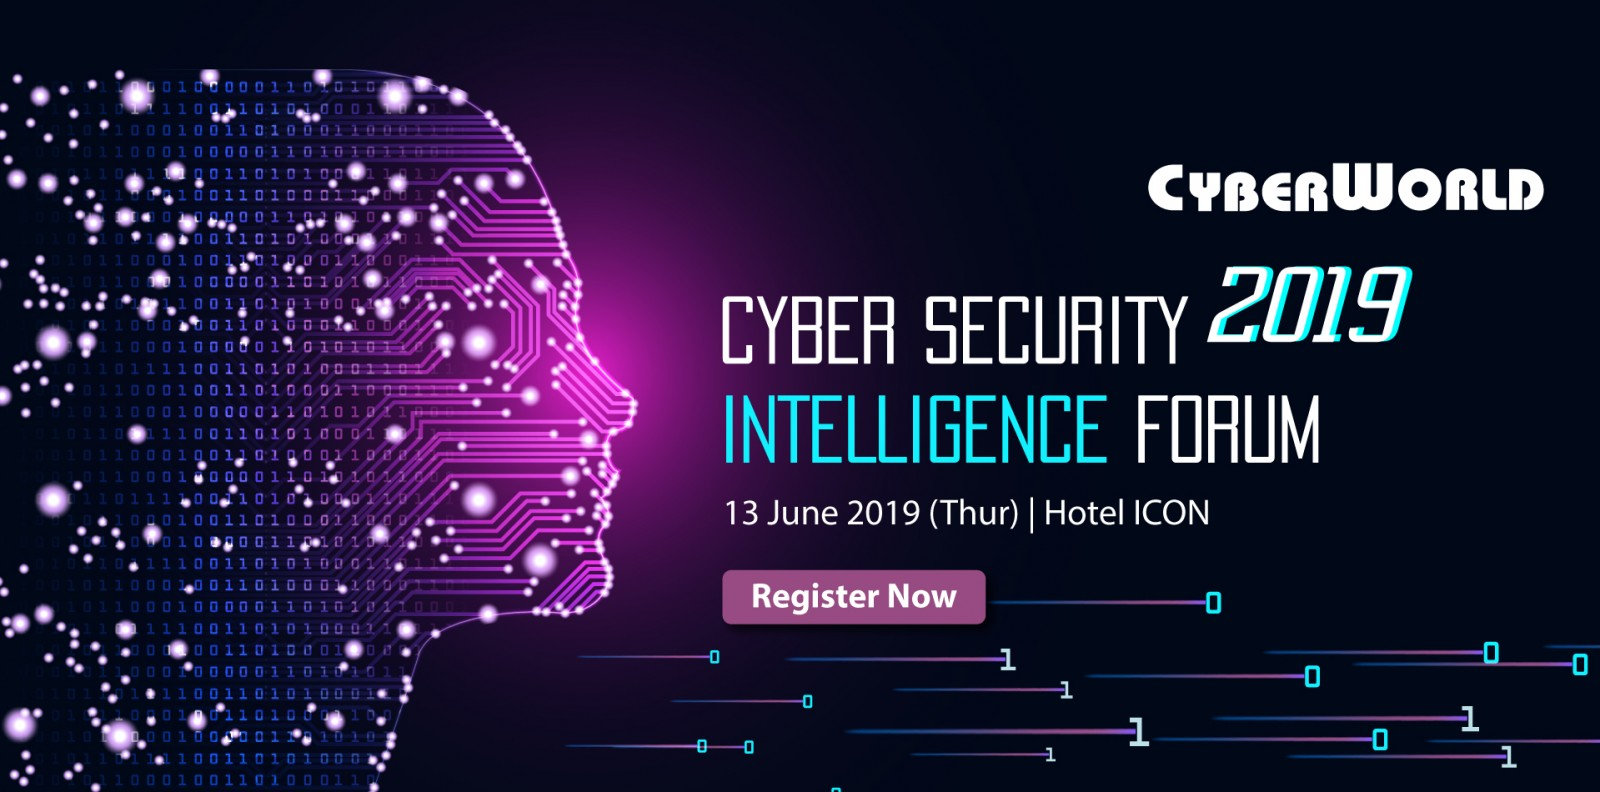 Cyberworld Cyber Security Intelligence Forum 2019